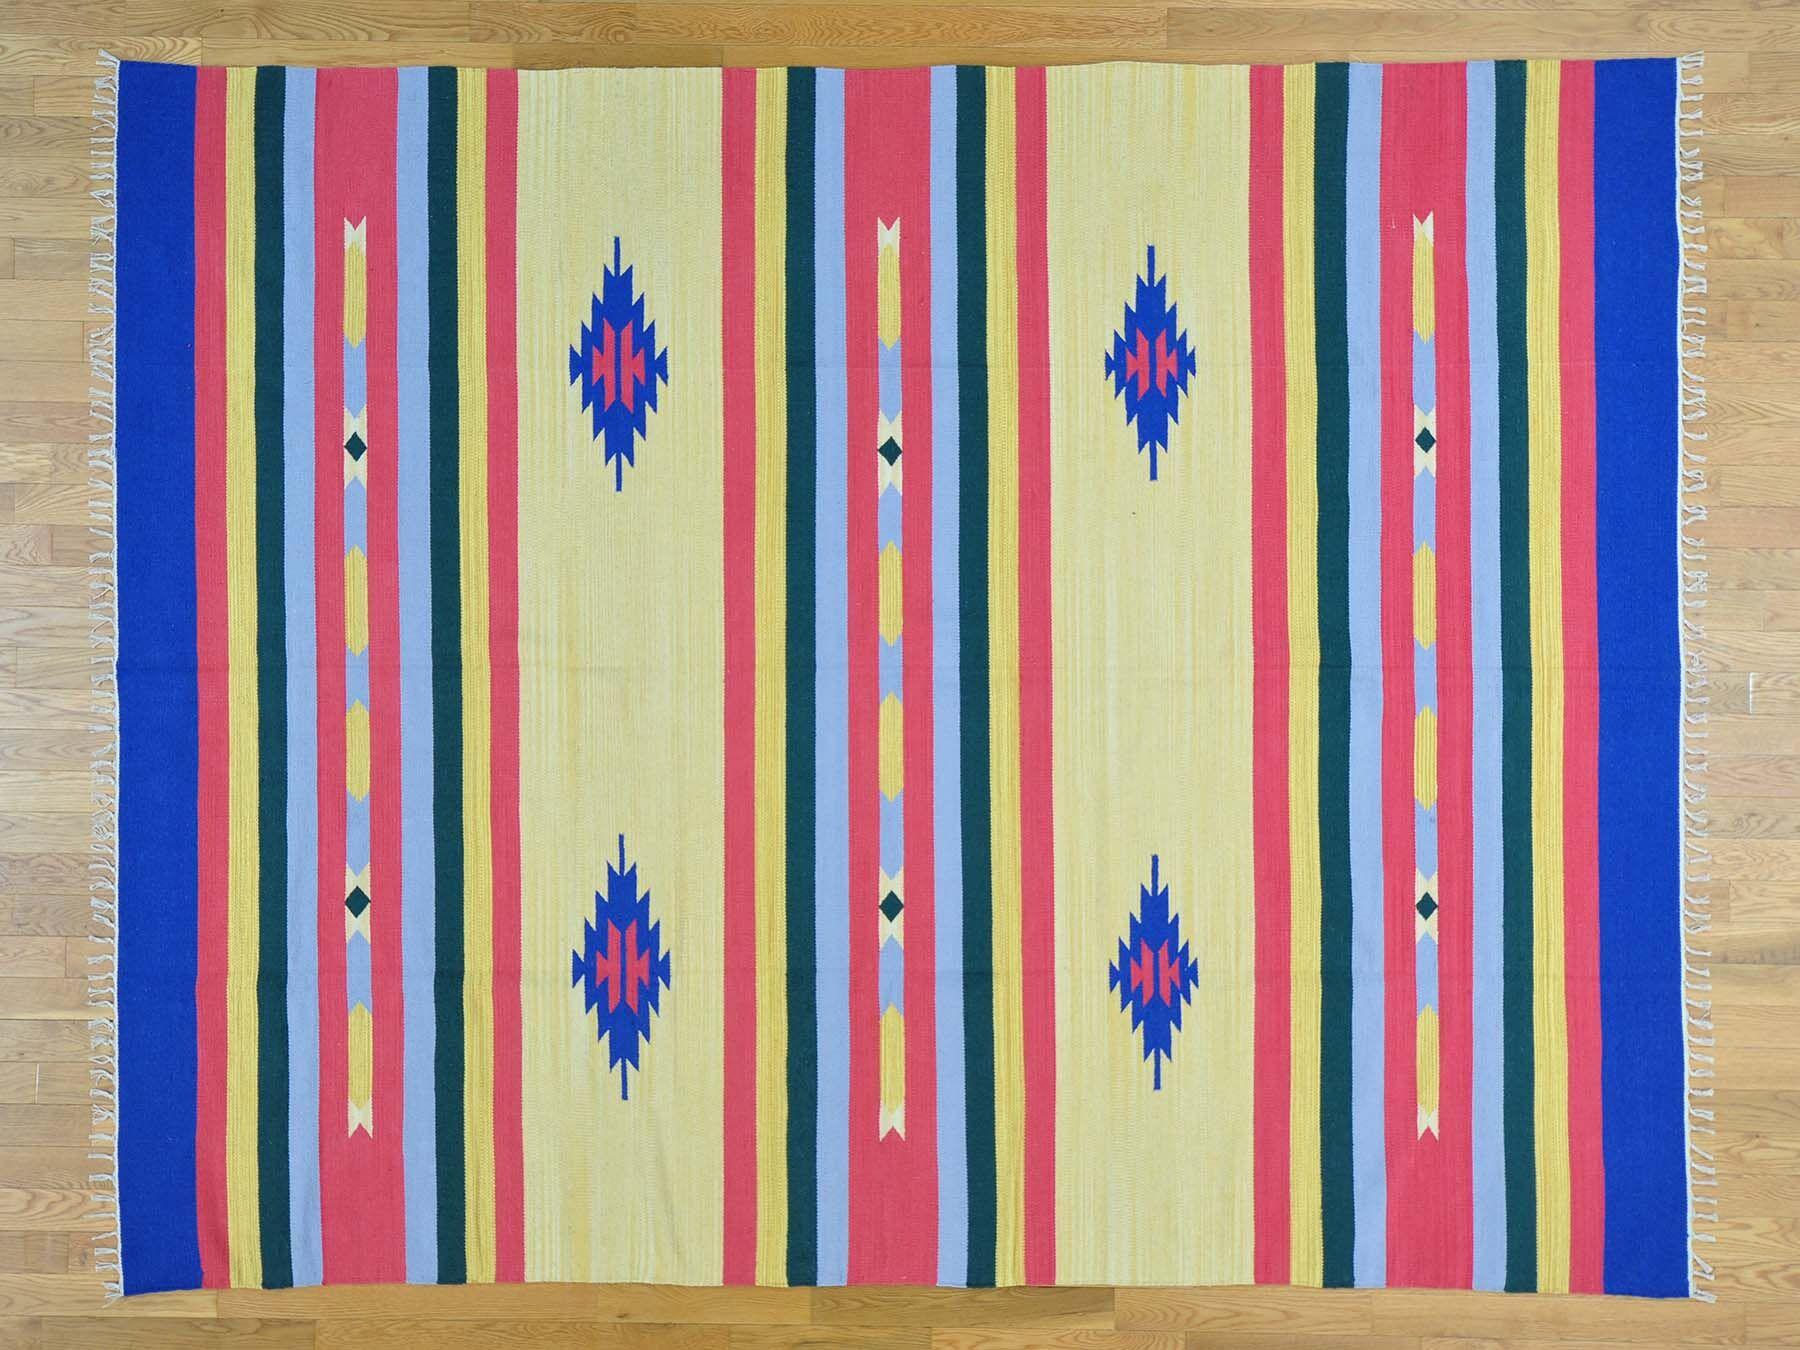 One-of-a-Kind Biarritz Killim Southwestern Design Handwoven Wool Area Rug